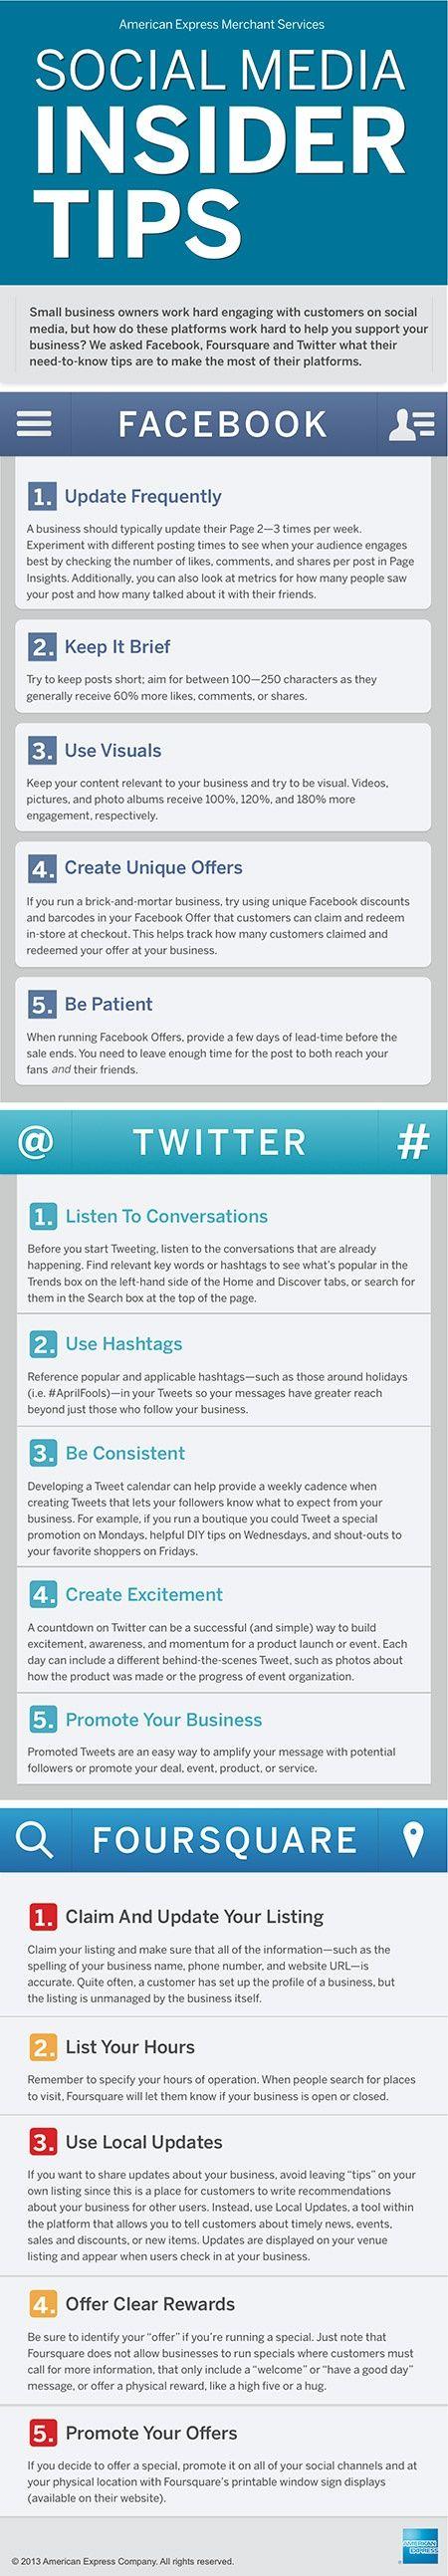 Social Media Tips for engaging Social Media Marketing #Infographic